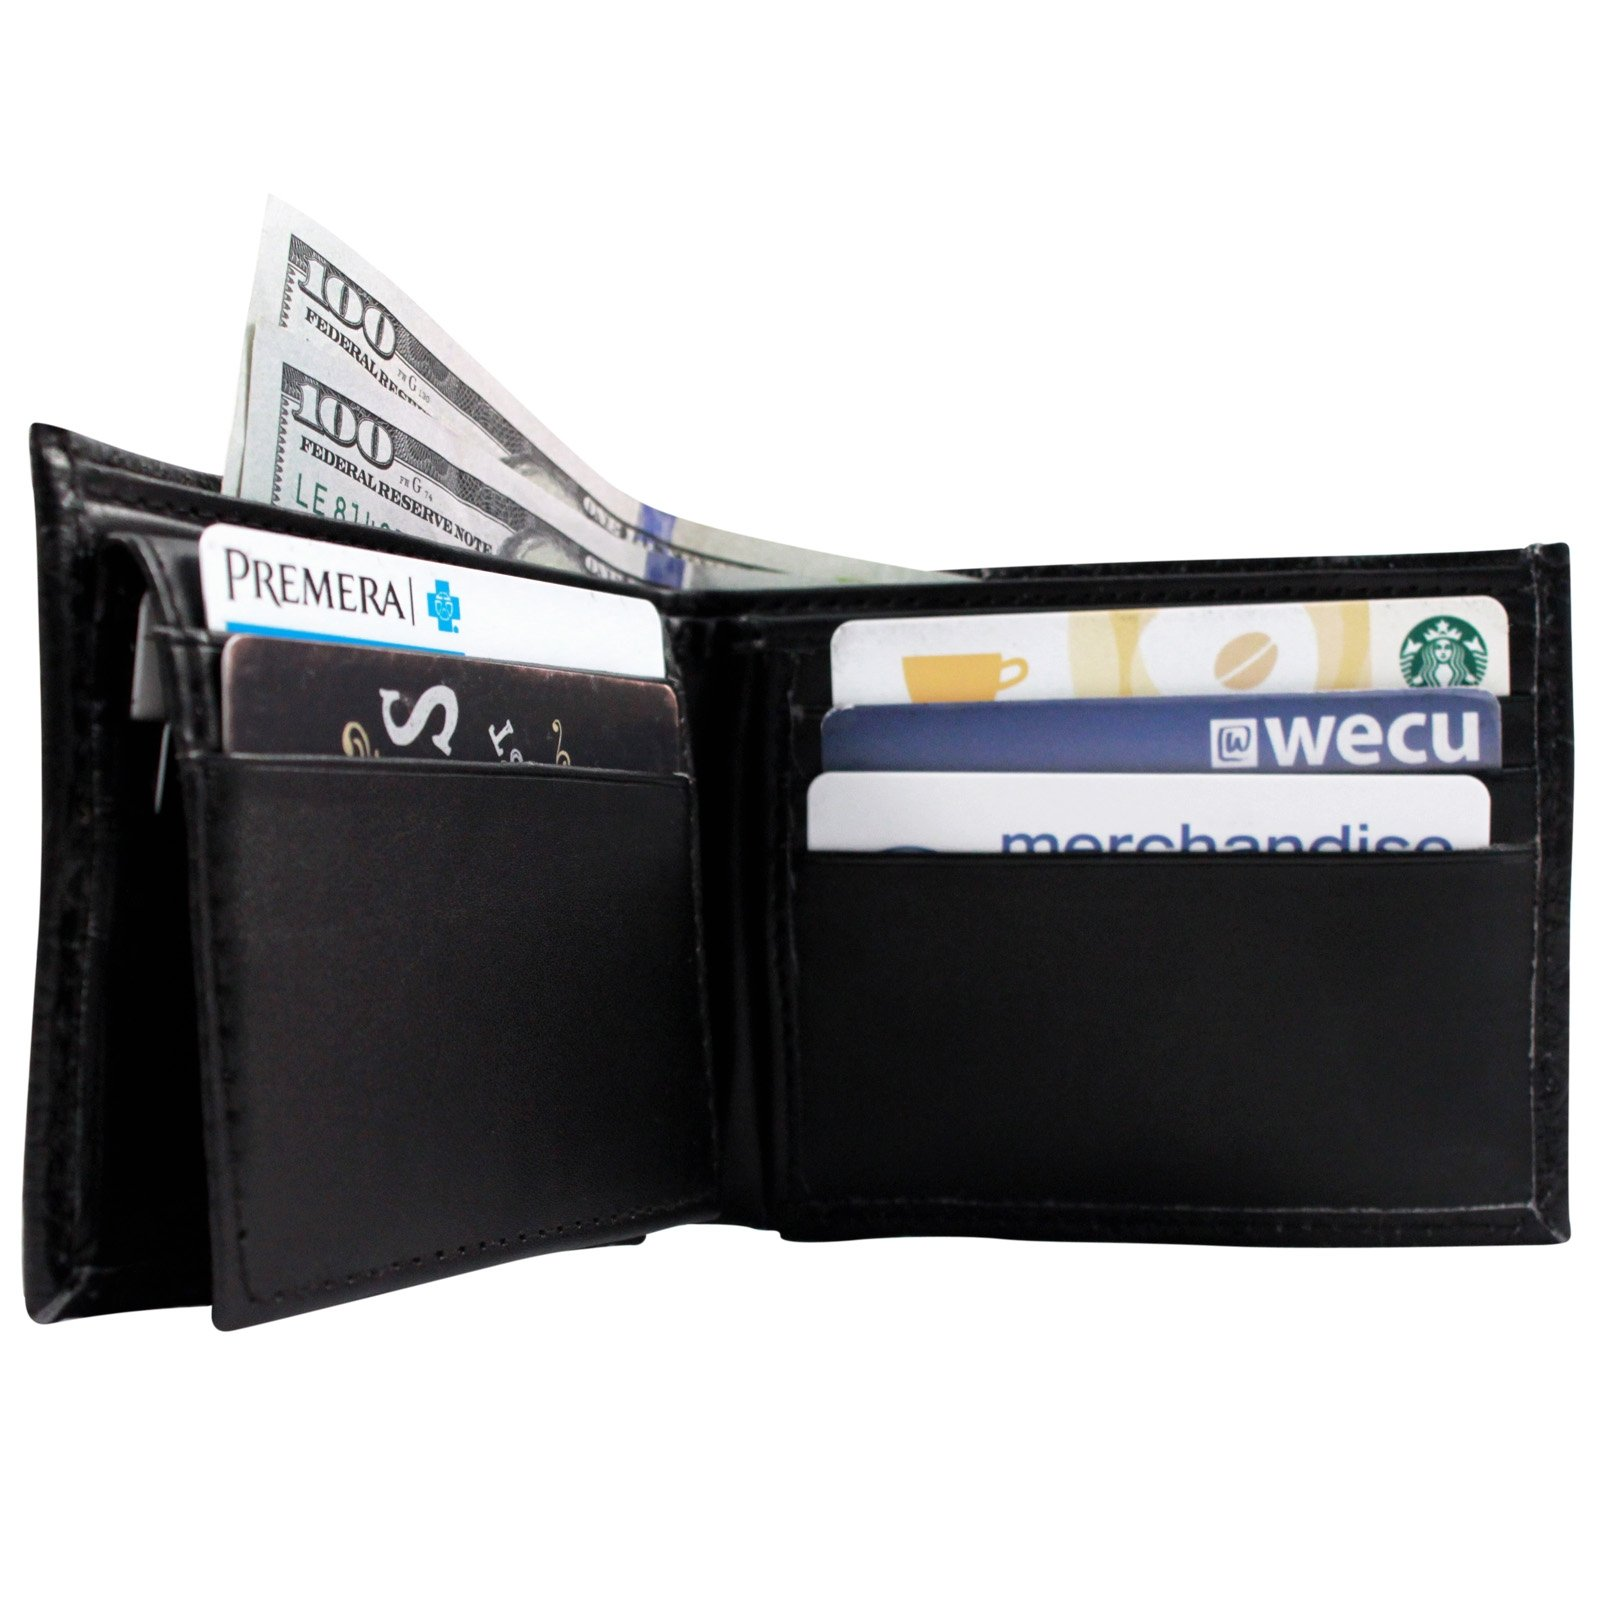 Brandon Dallas Genuine Cowhide Bifold Leather Wallet - Black Ostrich